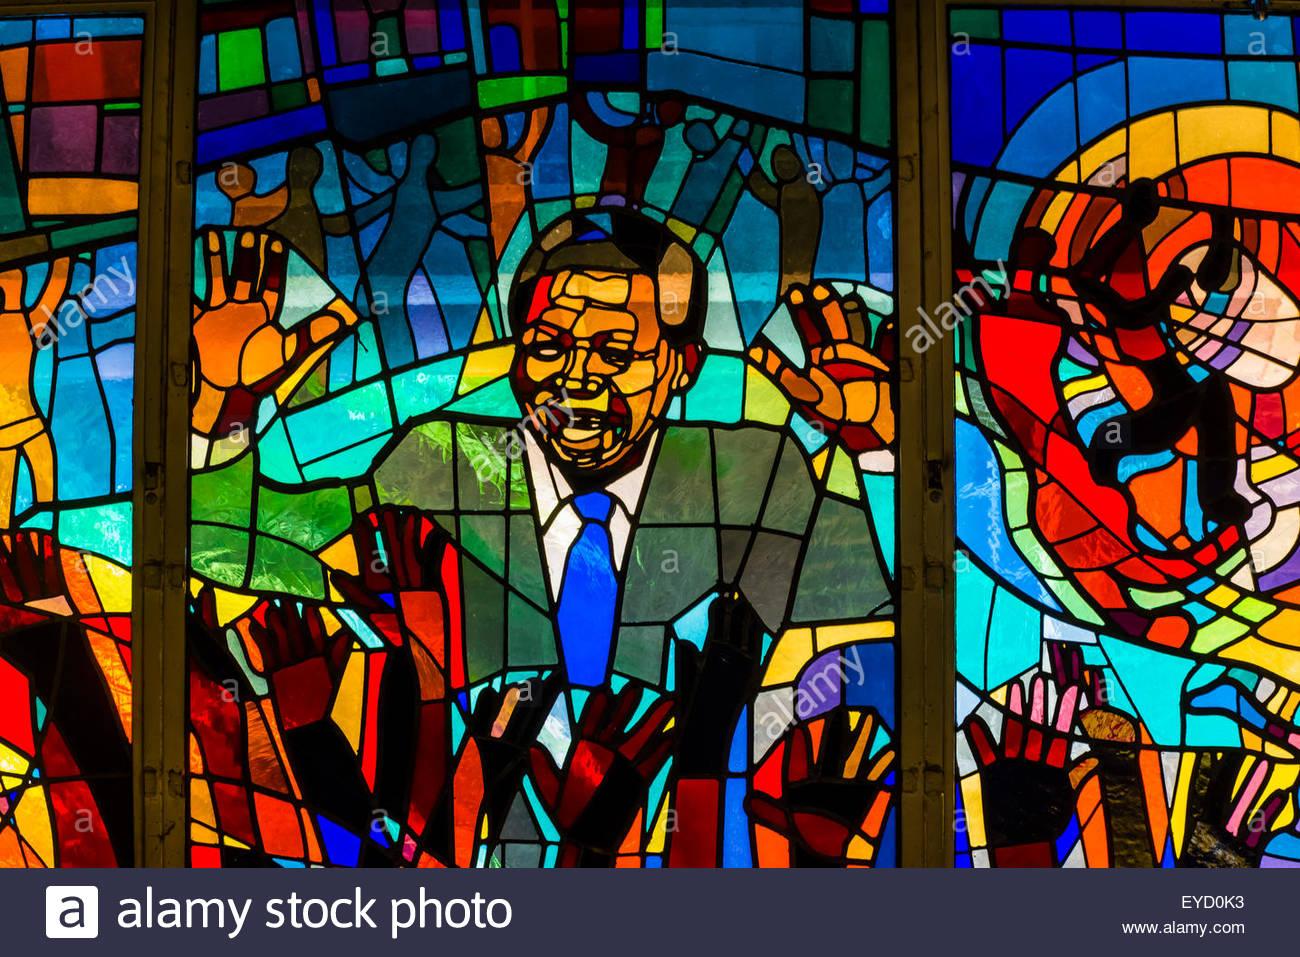 Nelson Mandela stained glass window at Regina Mundi Church, Soweto, Johannesburg, South Africa. It is the largest Stock Photo